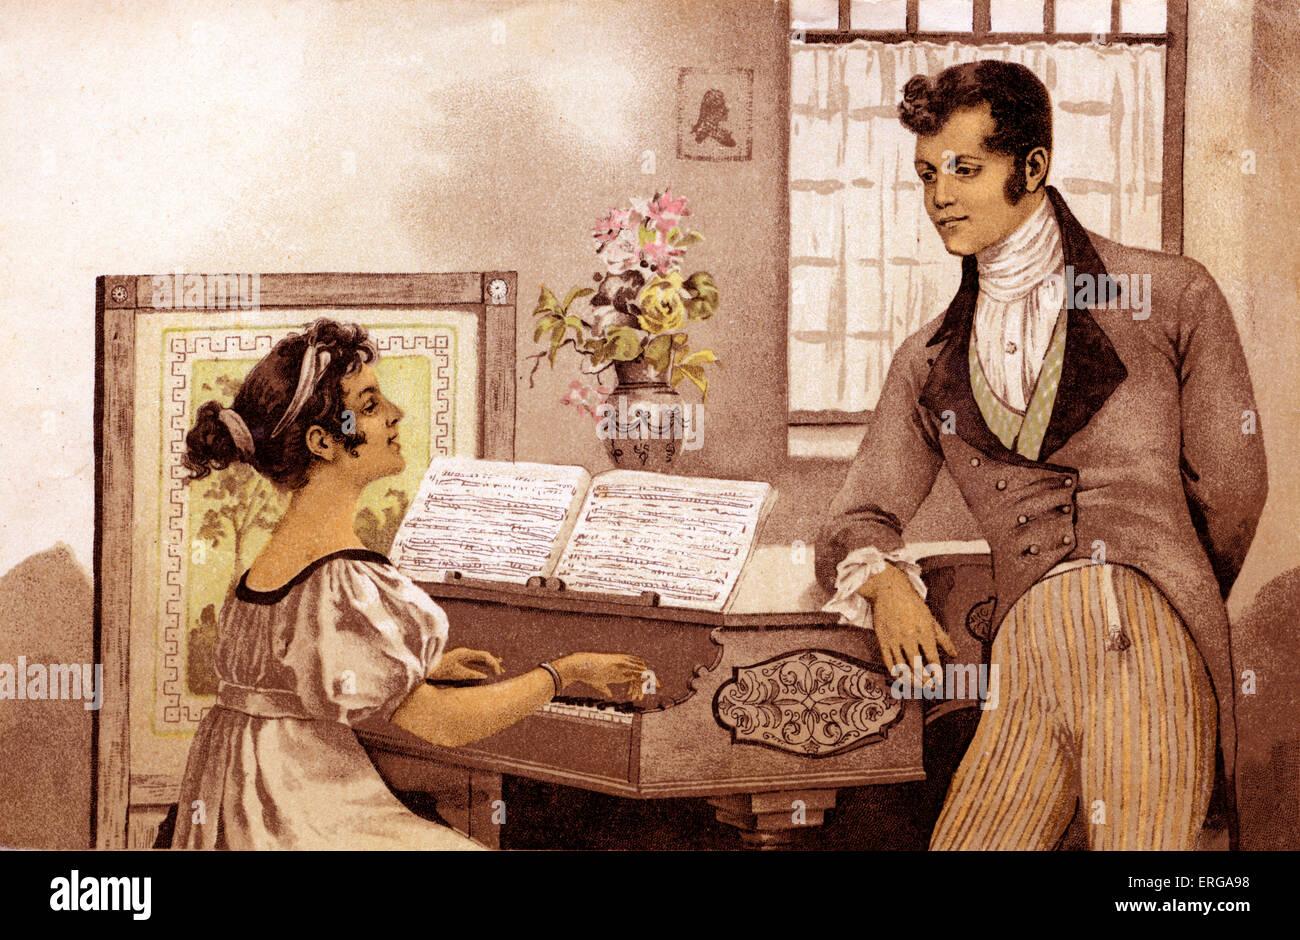 Regency par realizar duet (finales 18ª/comienzos del siglo xix). Imagen De Stock